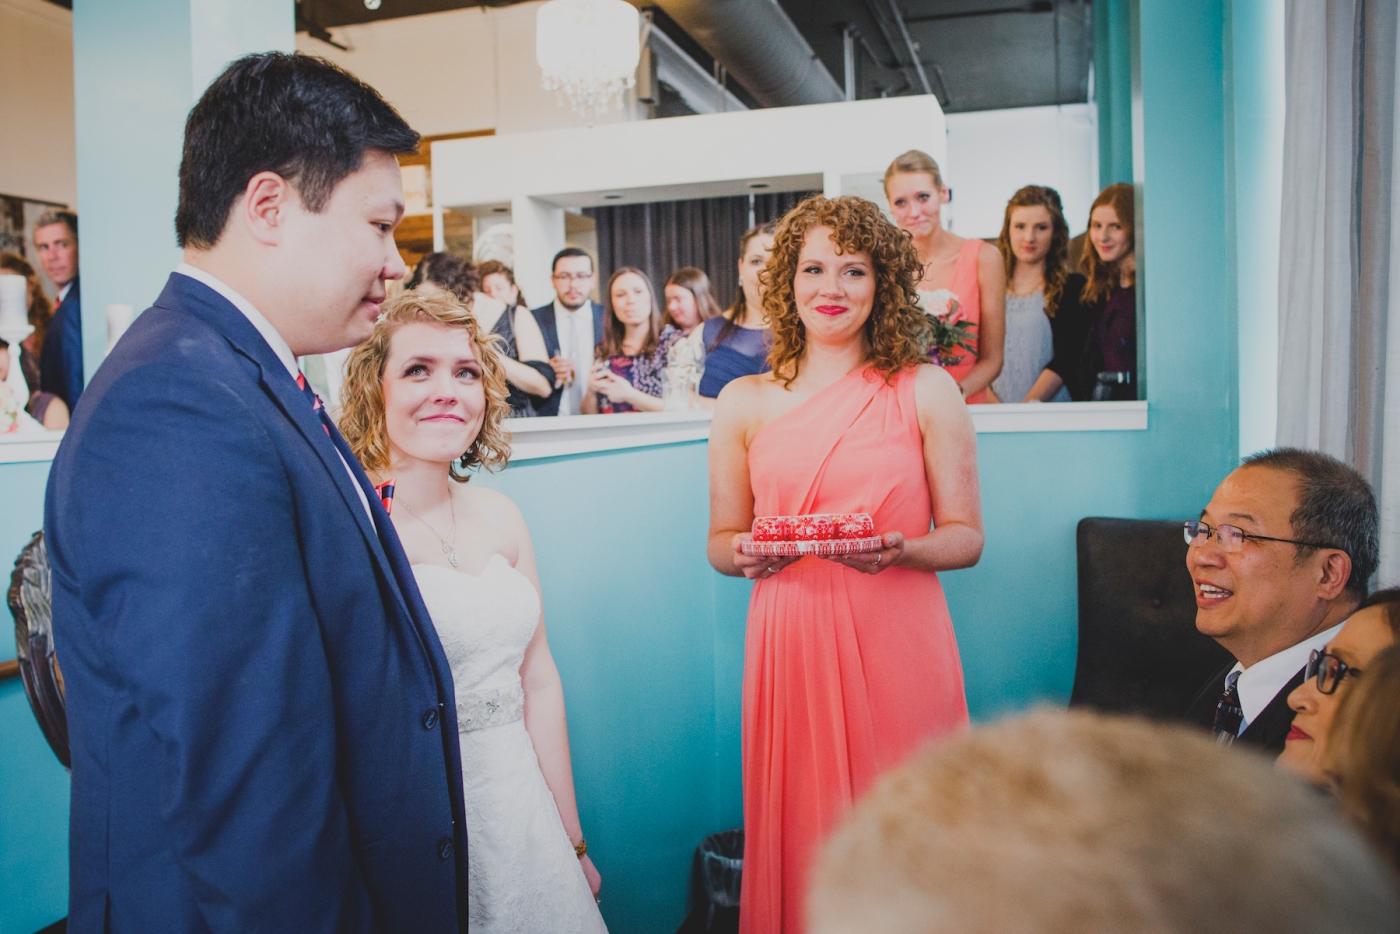 DSC_2982Everett_Wedding_Ballroom_Jane_Speleers_photography_Rachel_and_Edmund_teaceremony_2017